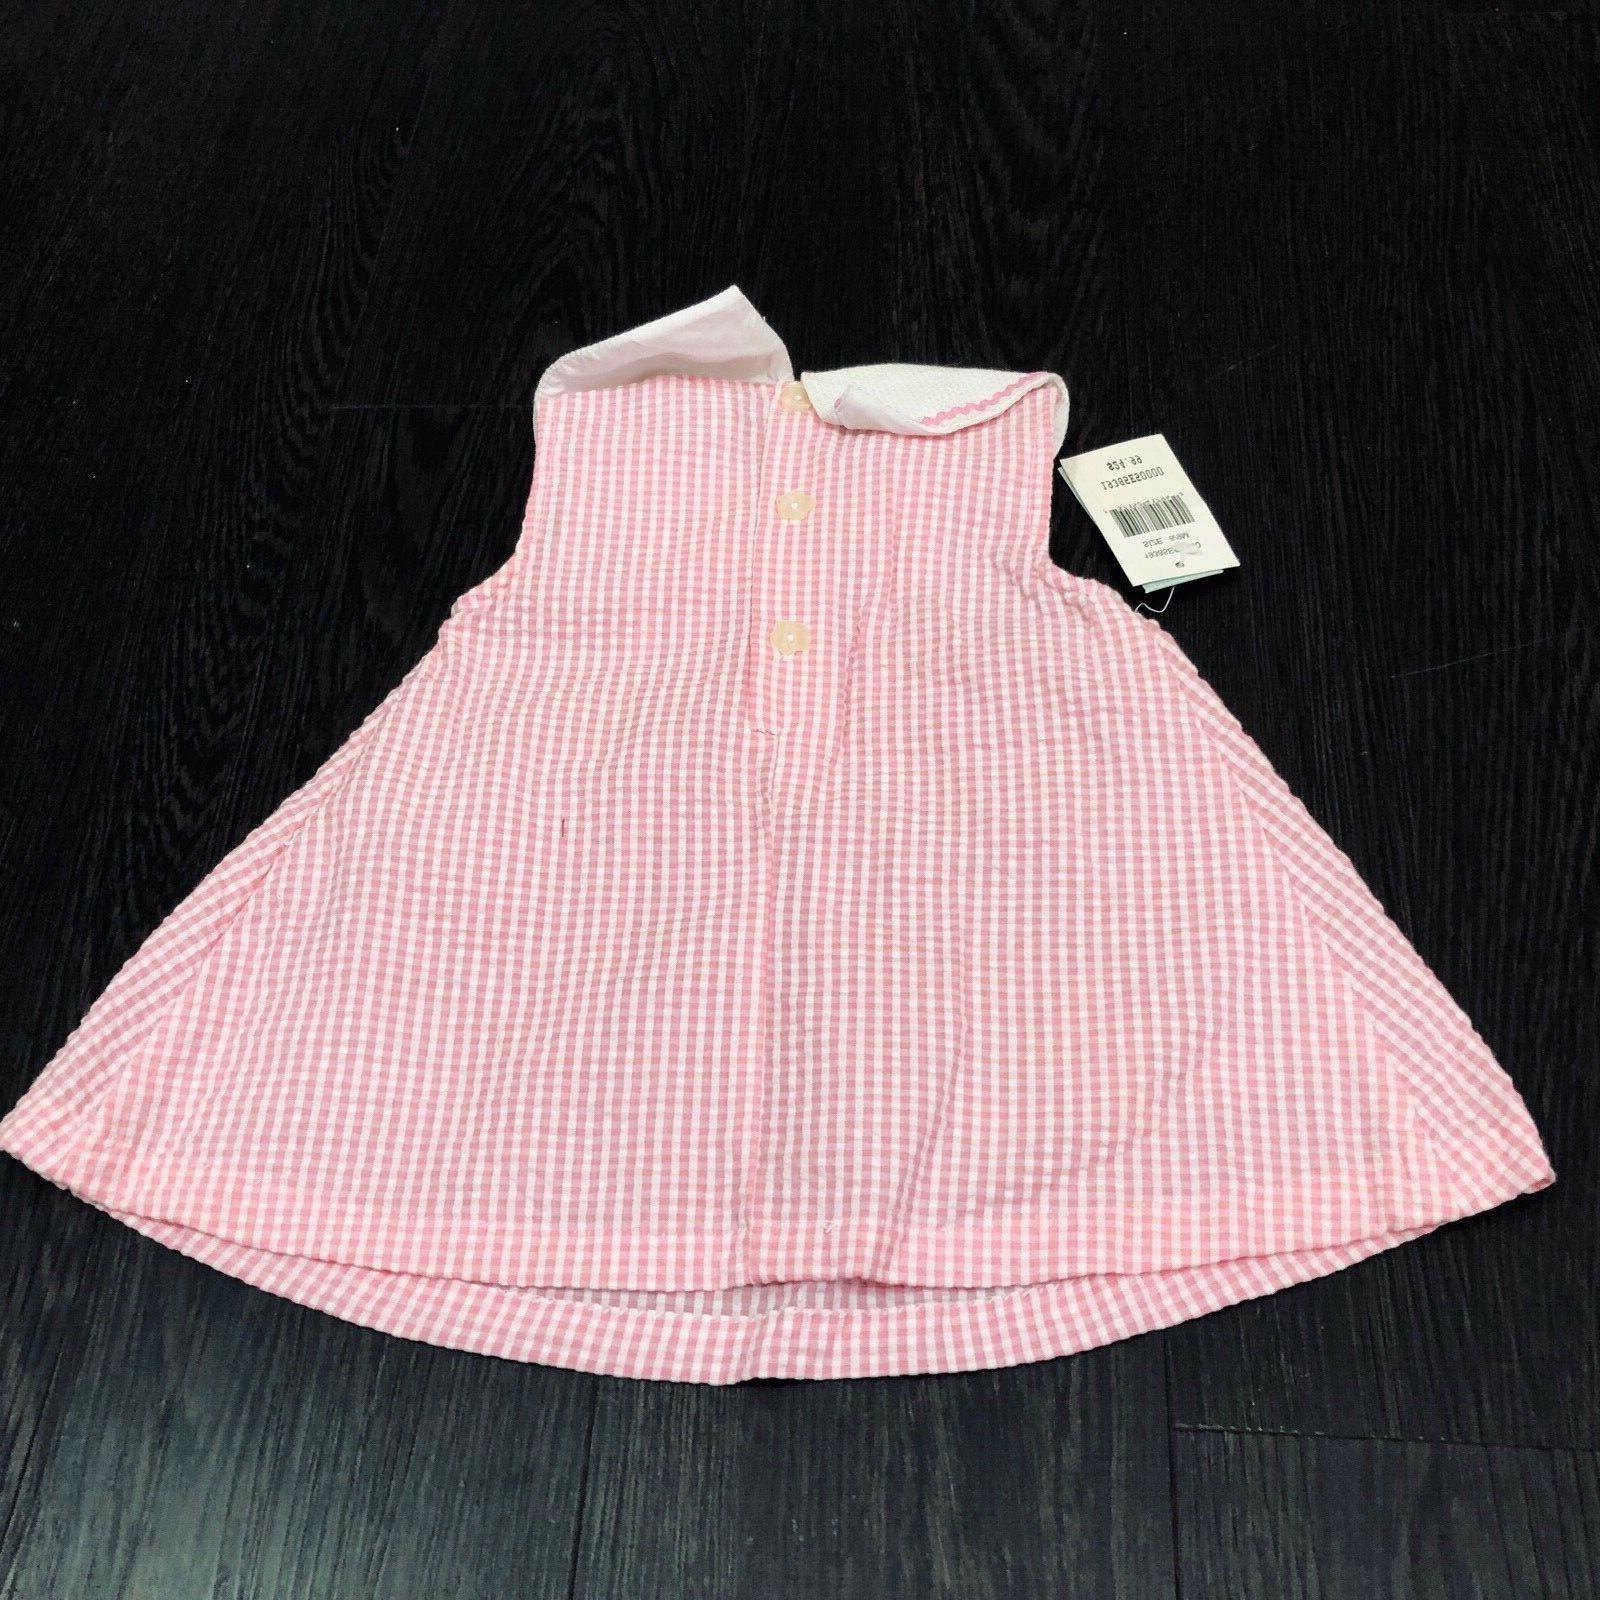 Walt Disney Girl's Size Mons the Dress Pink